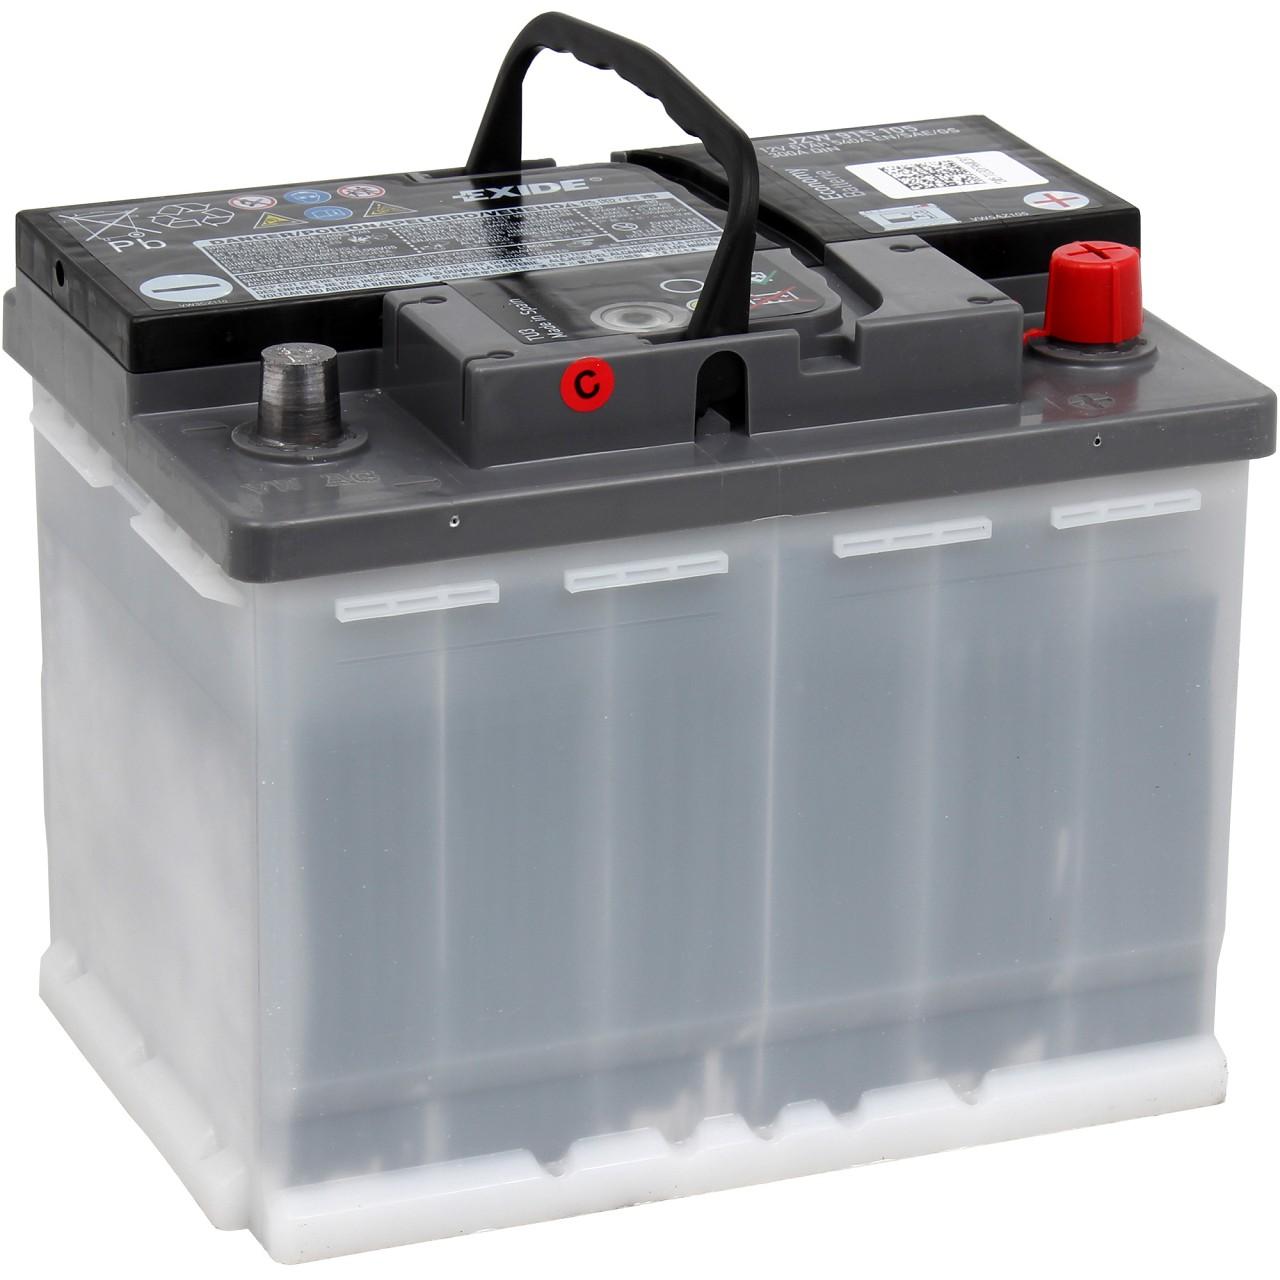 ORIGINAL VW Autobatterie Batterie Starterbatterie 12V 61Ah 300/540A JZW915105